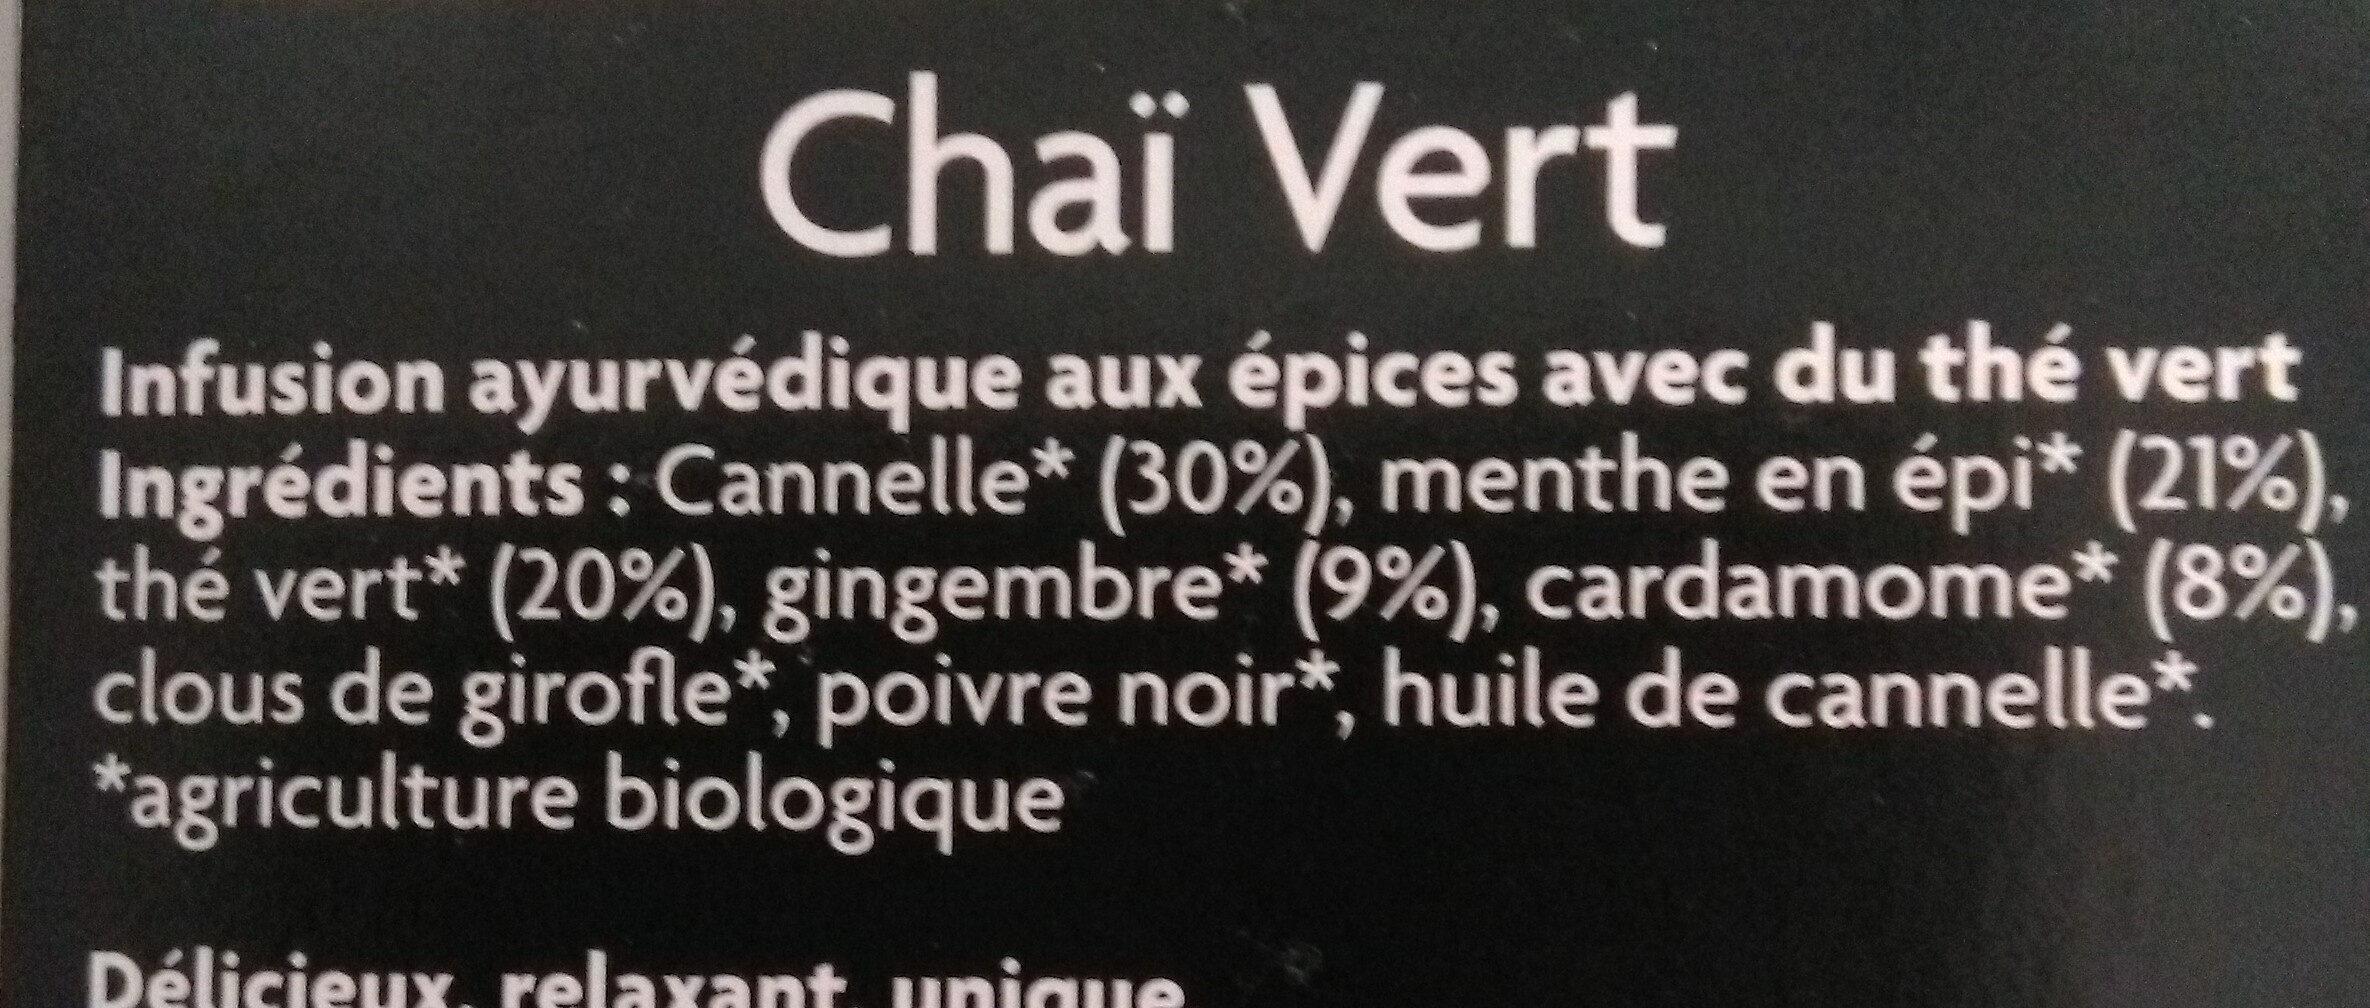 Chaï Vert - 17 Sachets - Yogi Tea - Ingredients - fr